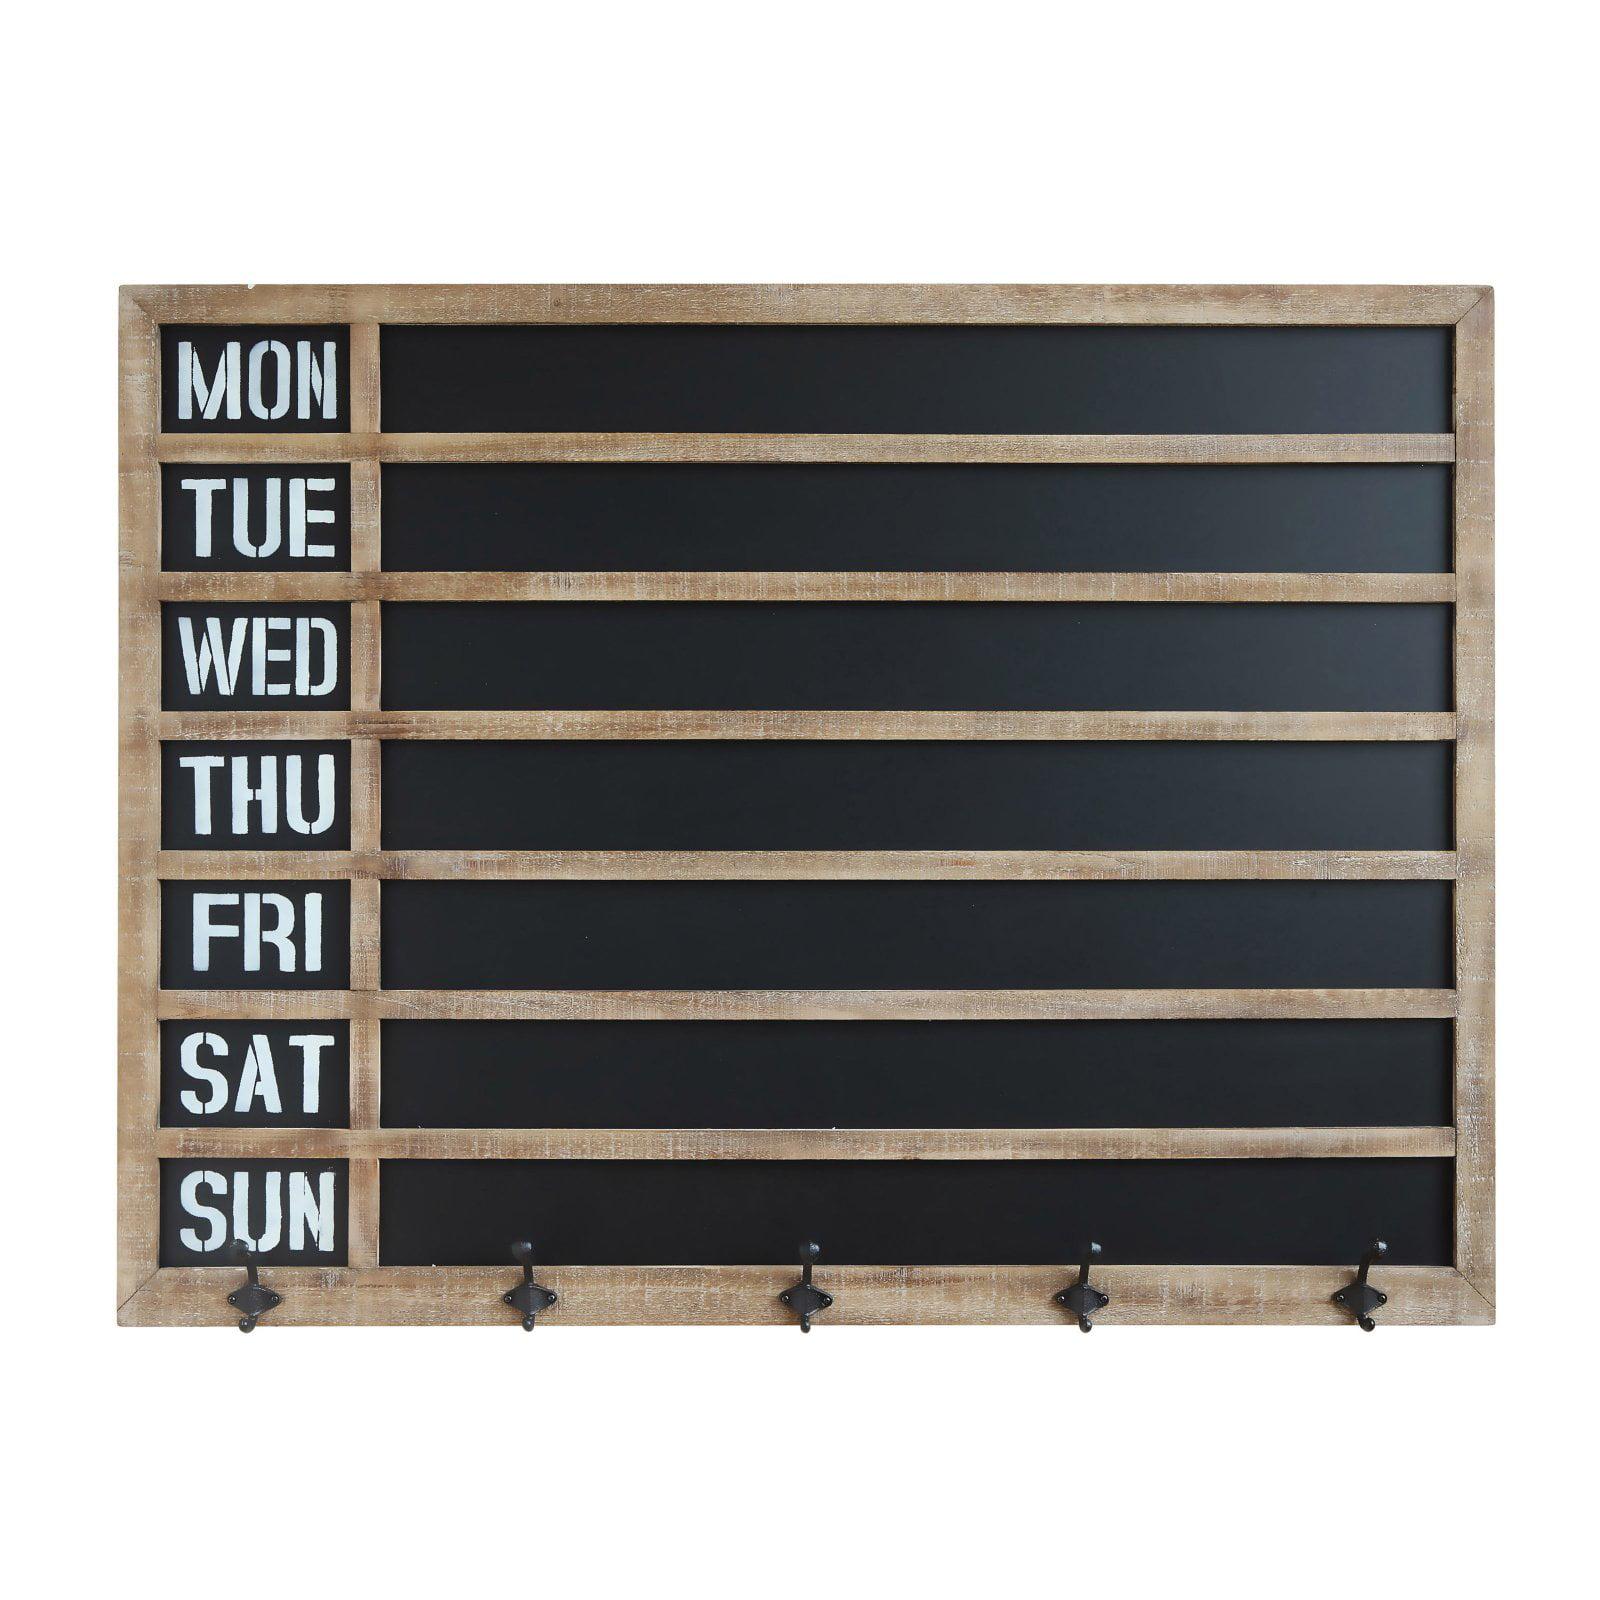 3R Studios Weekday Wall Chalkboard with 5 Metal Hooks by Creative Co-op Inc